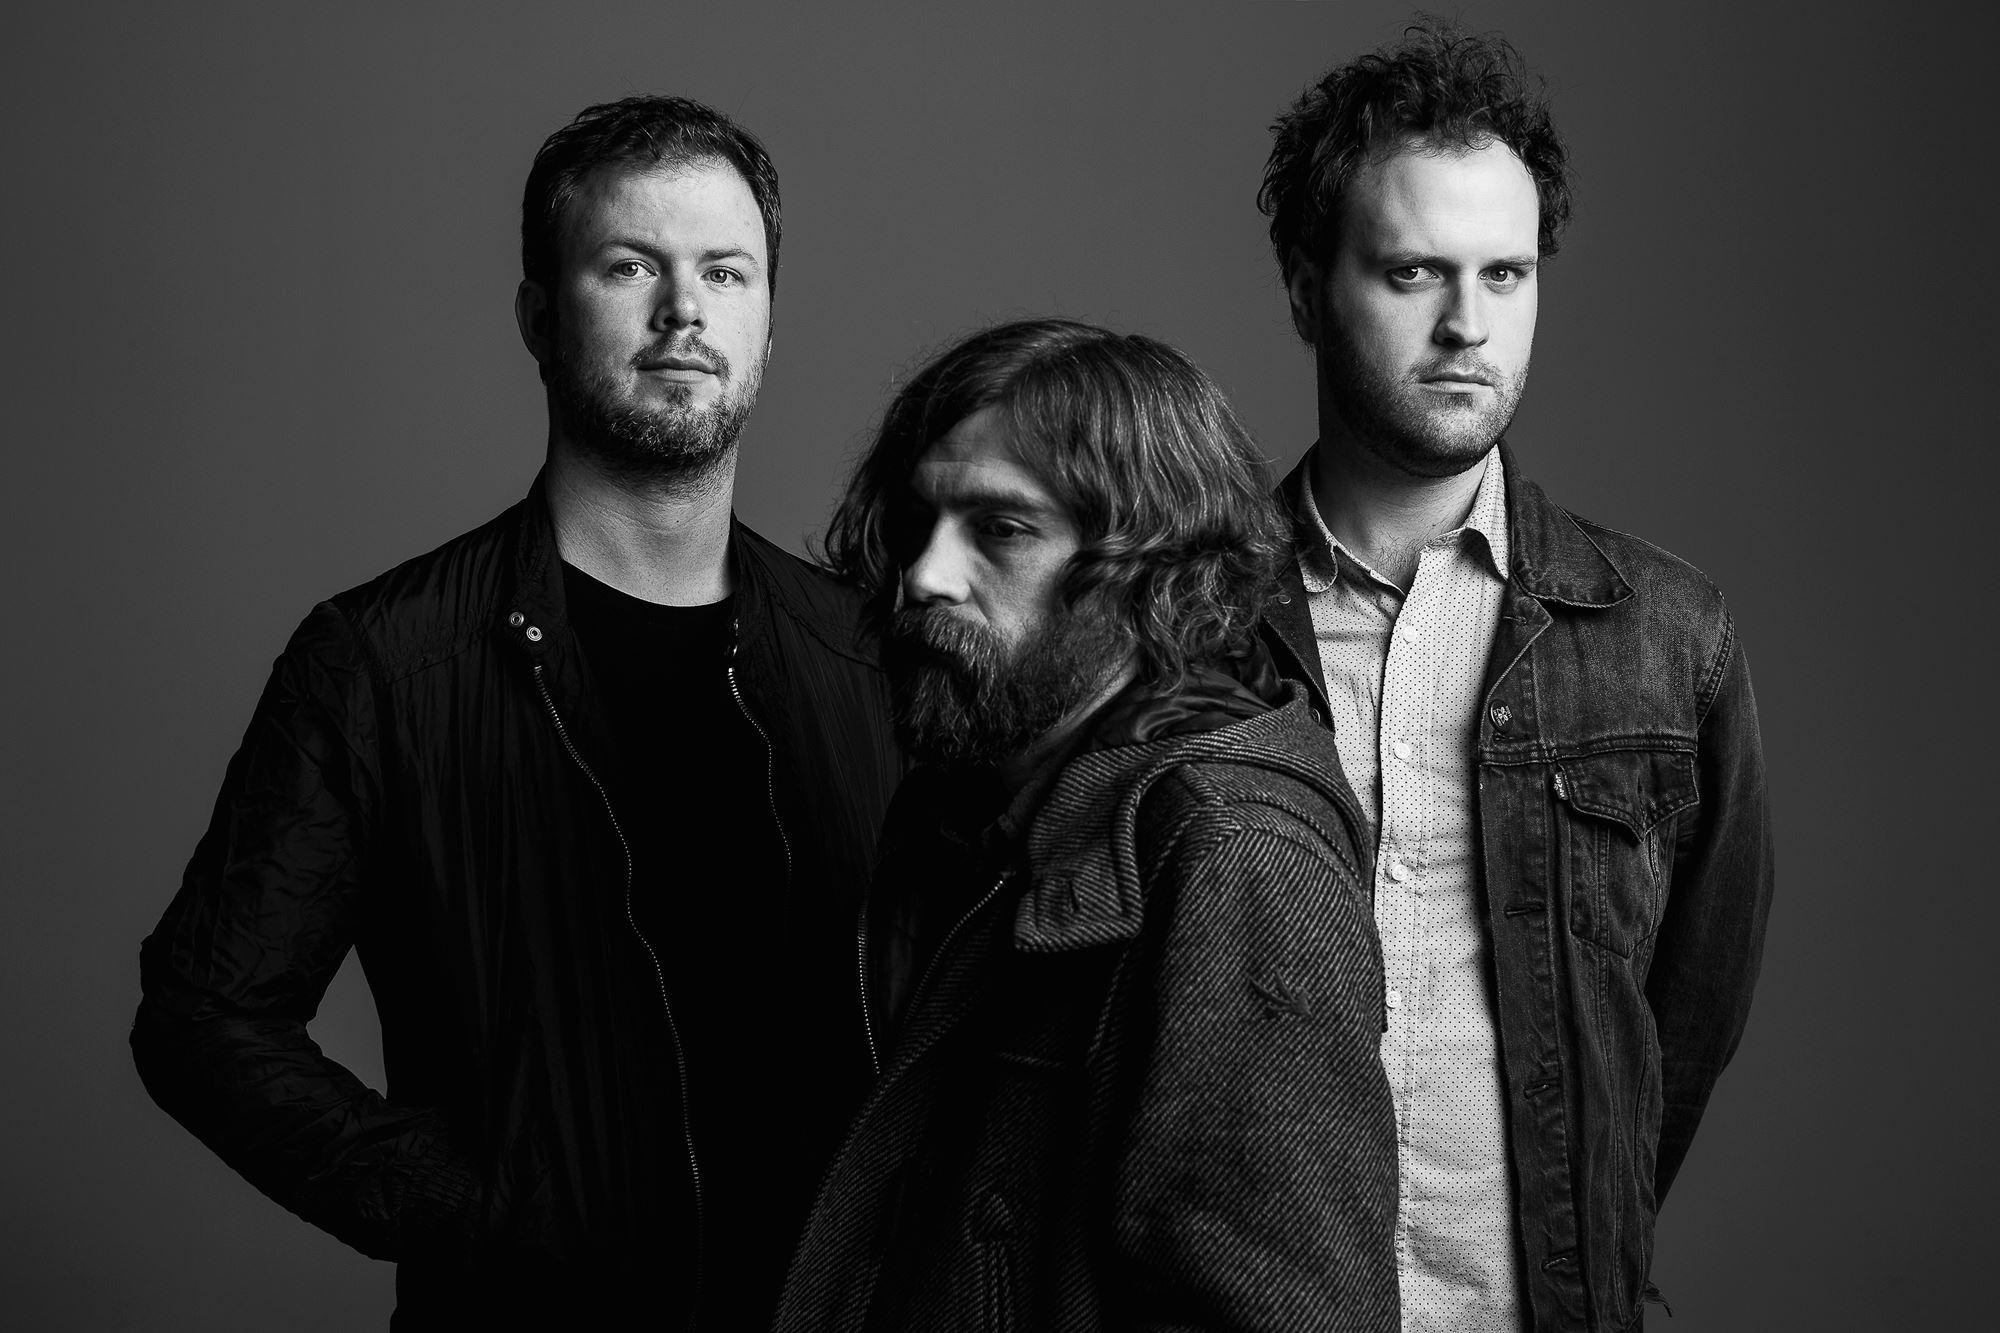 Canadian alt-rockers Wintersleep talk new album 'The Great Detachment'